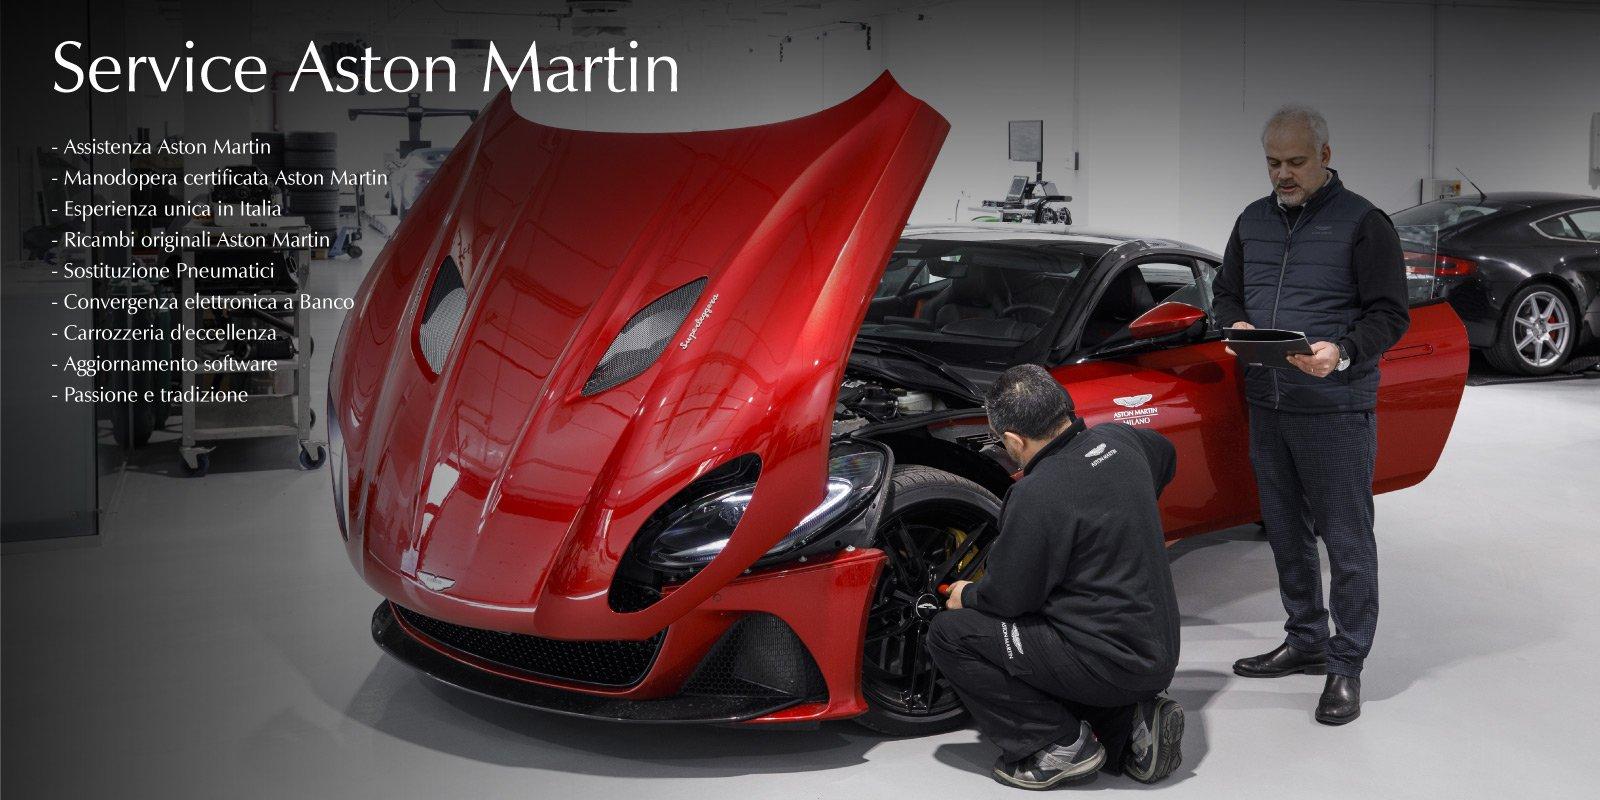 Service Aston Martin